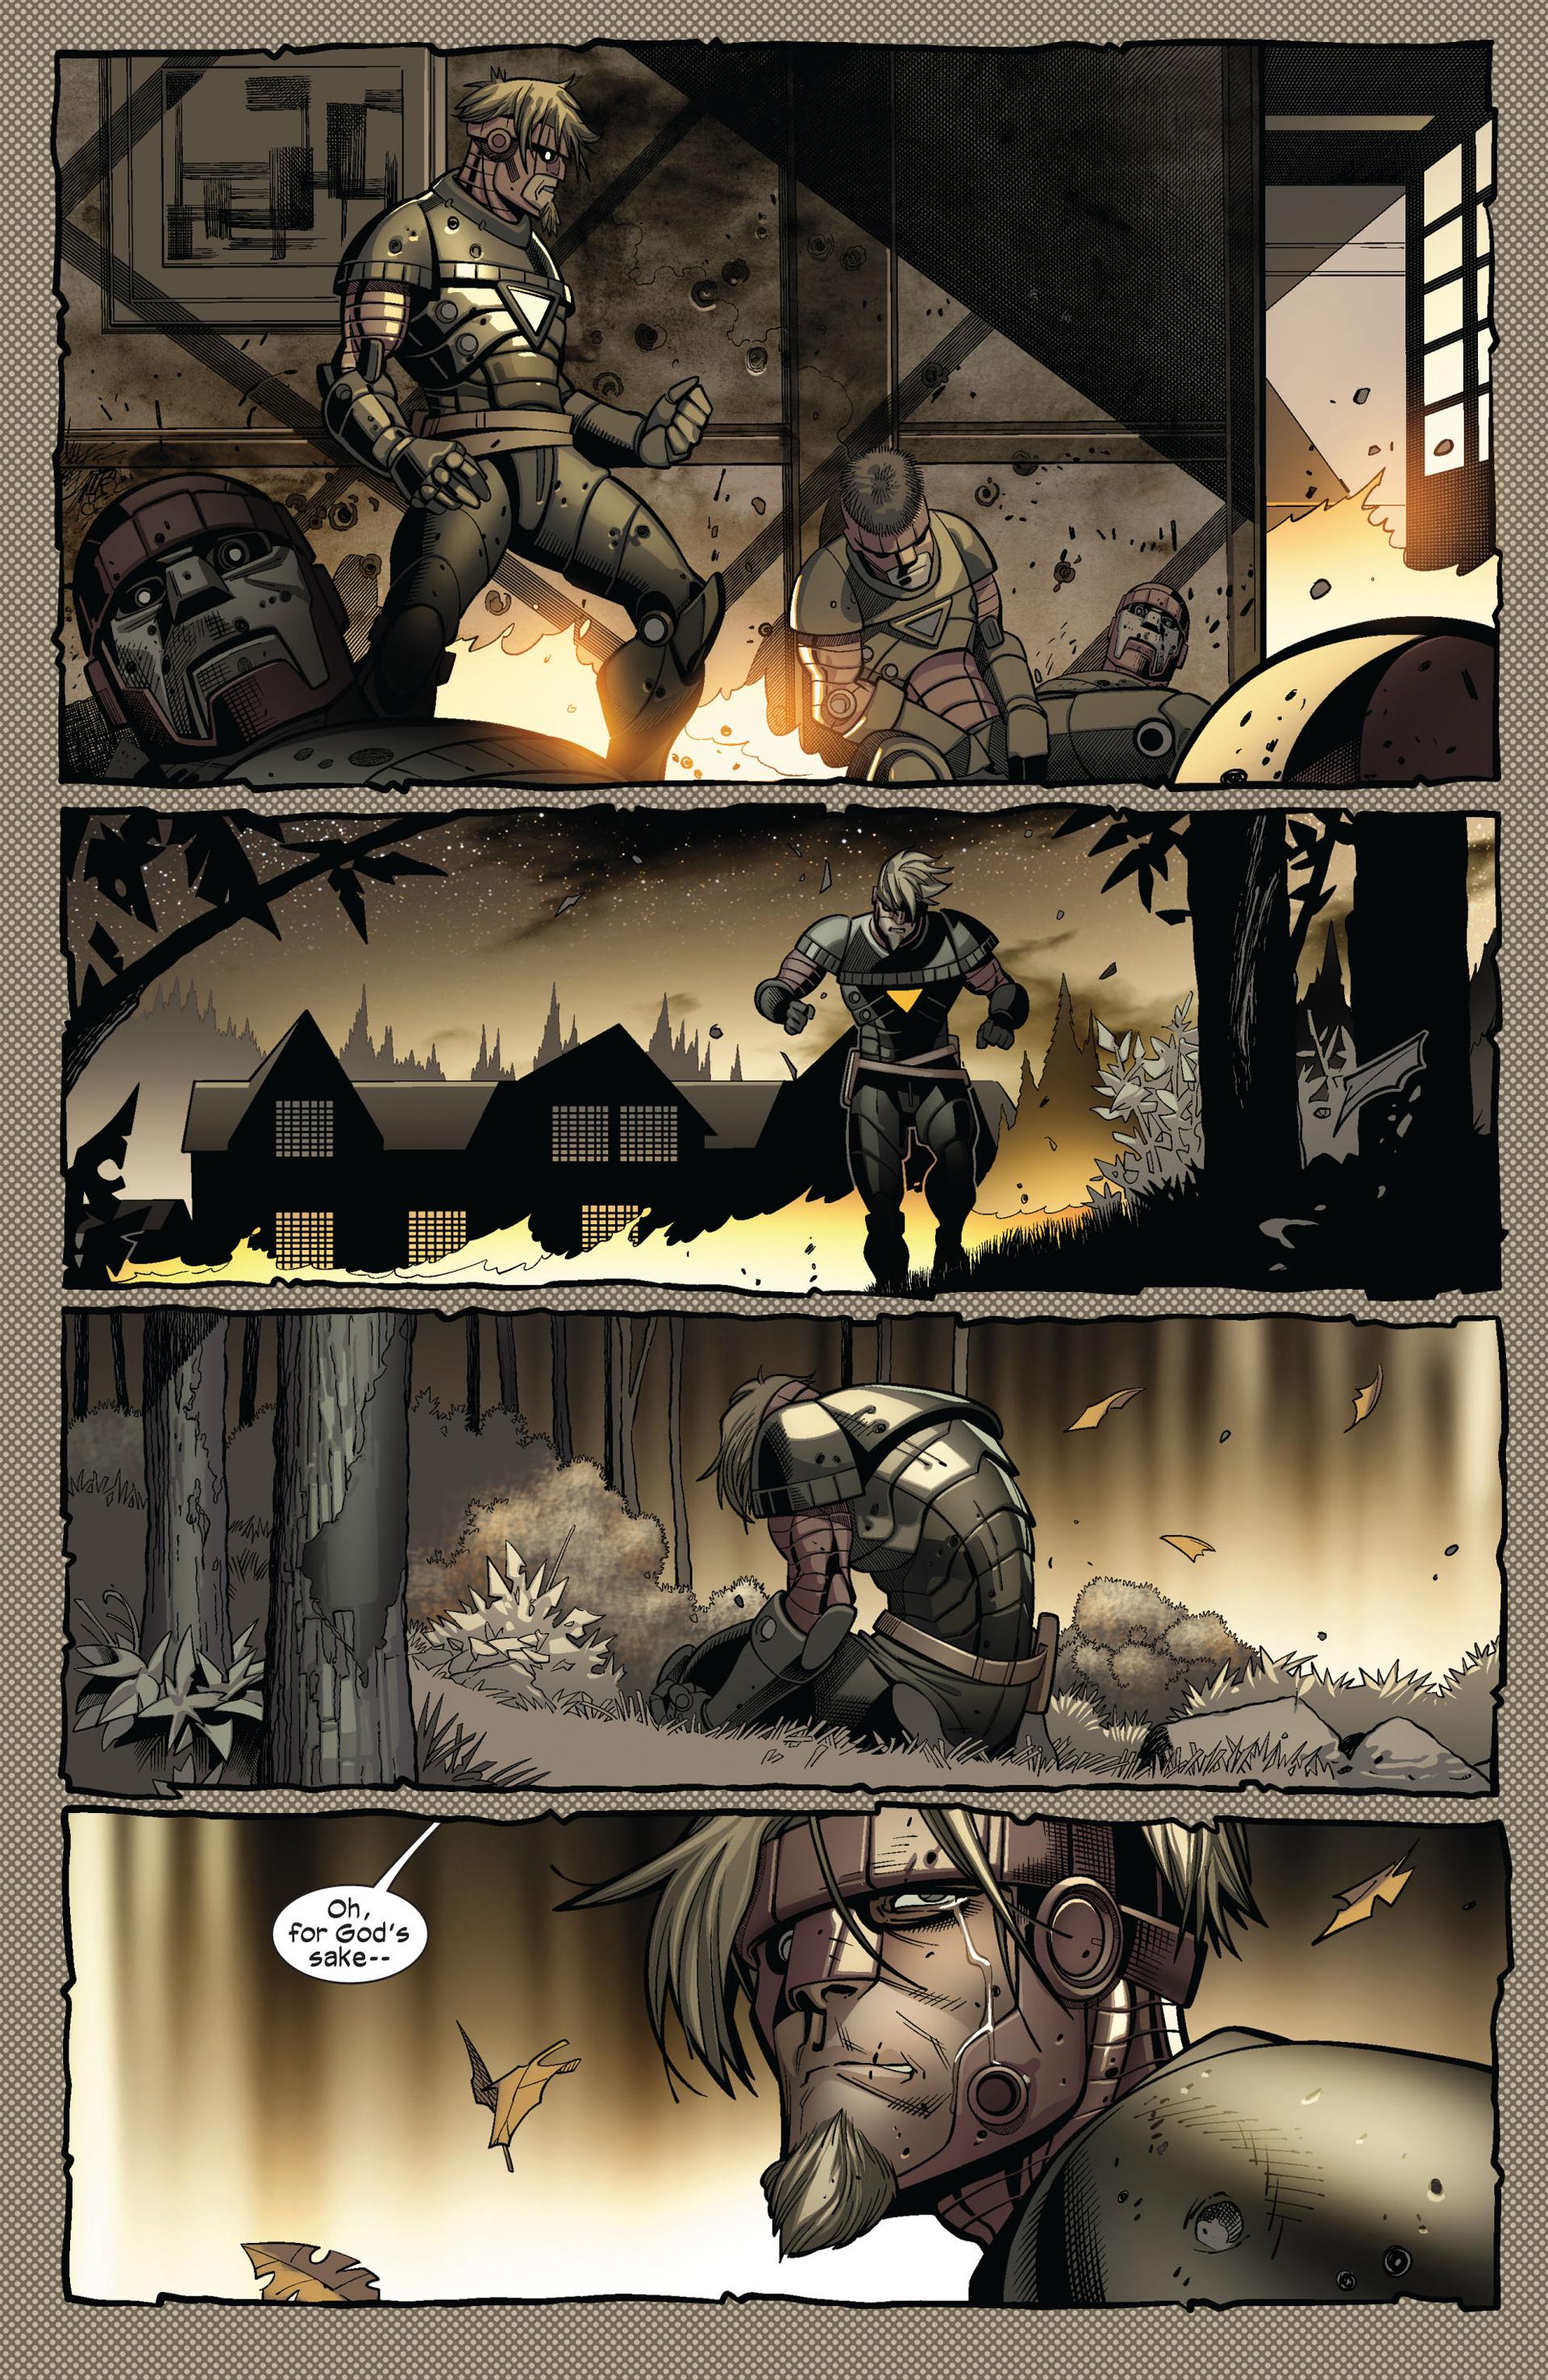 Read online Ultimate Comics X-Men comic -  Issue #4 - 5